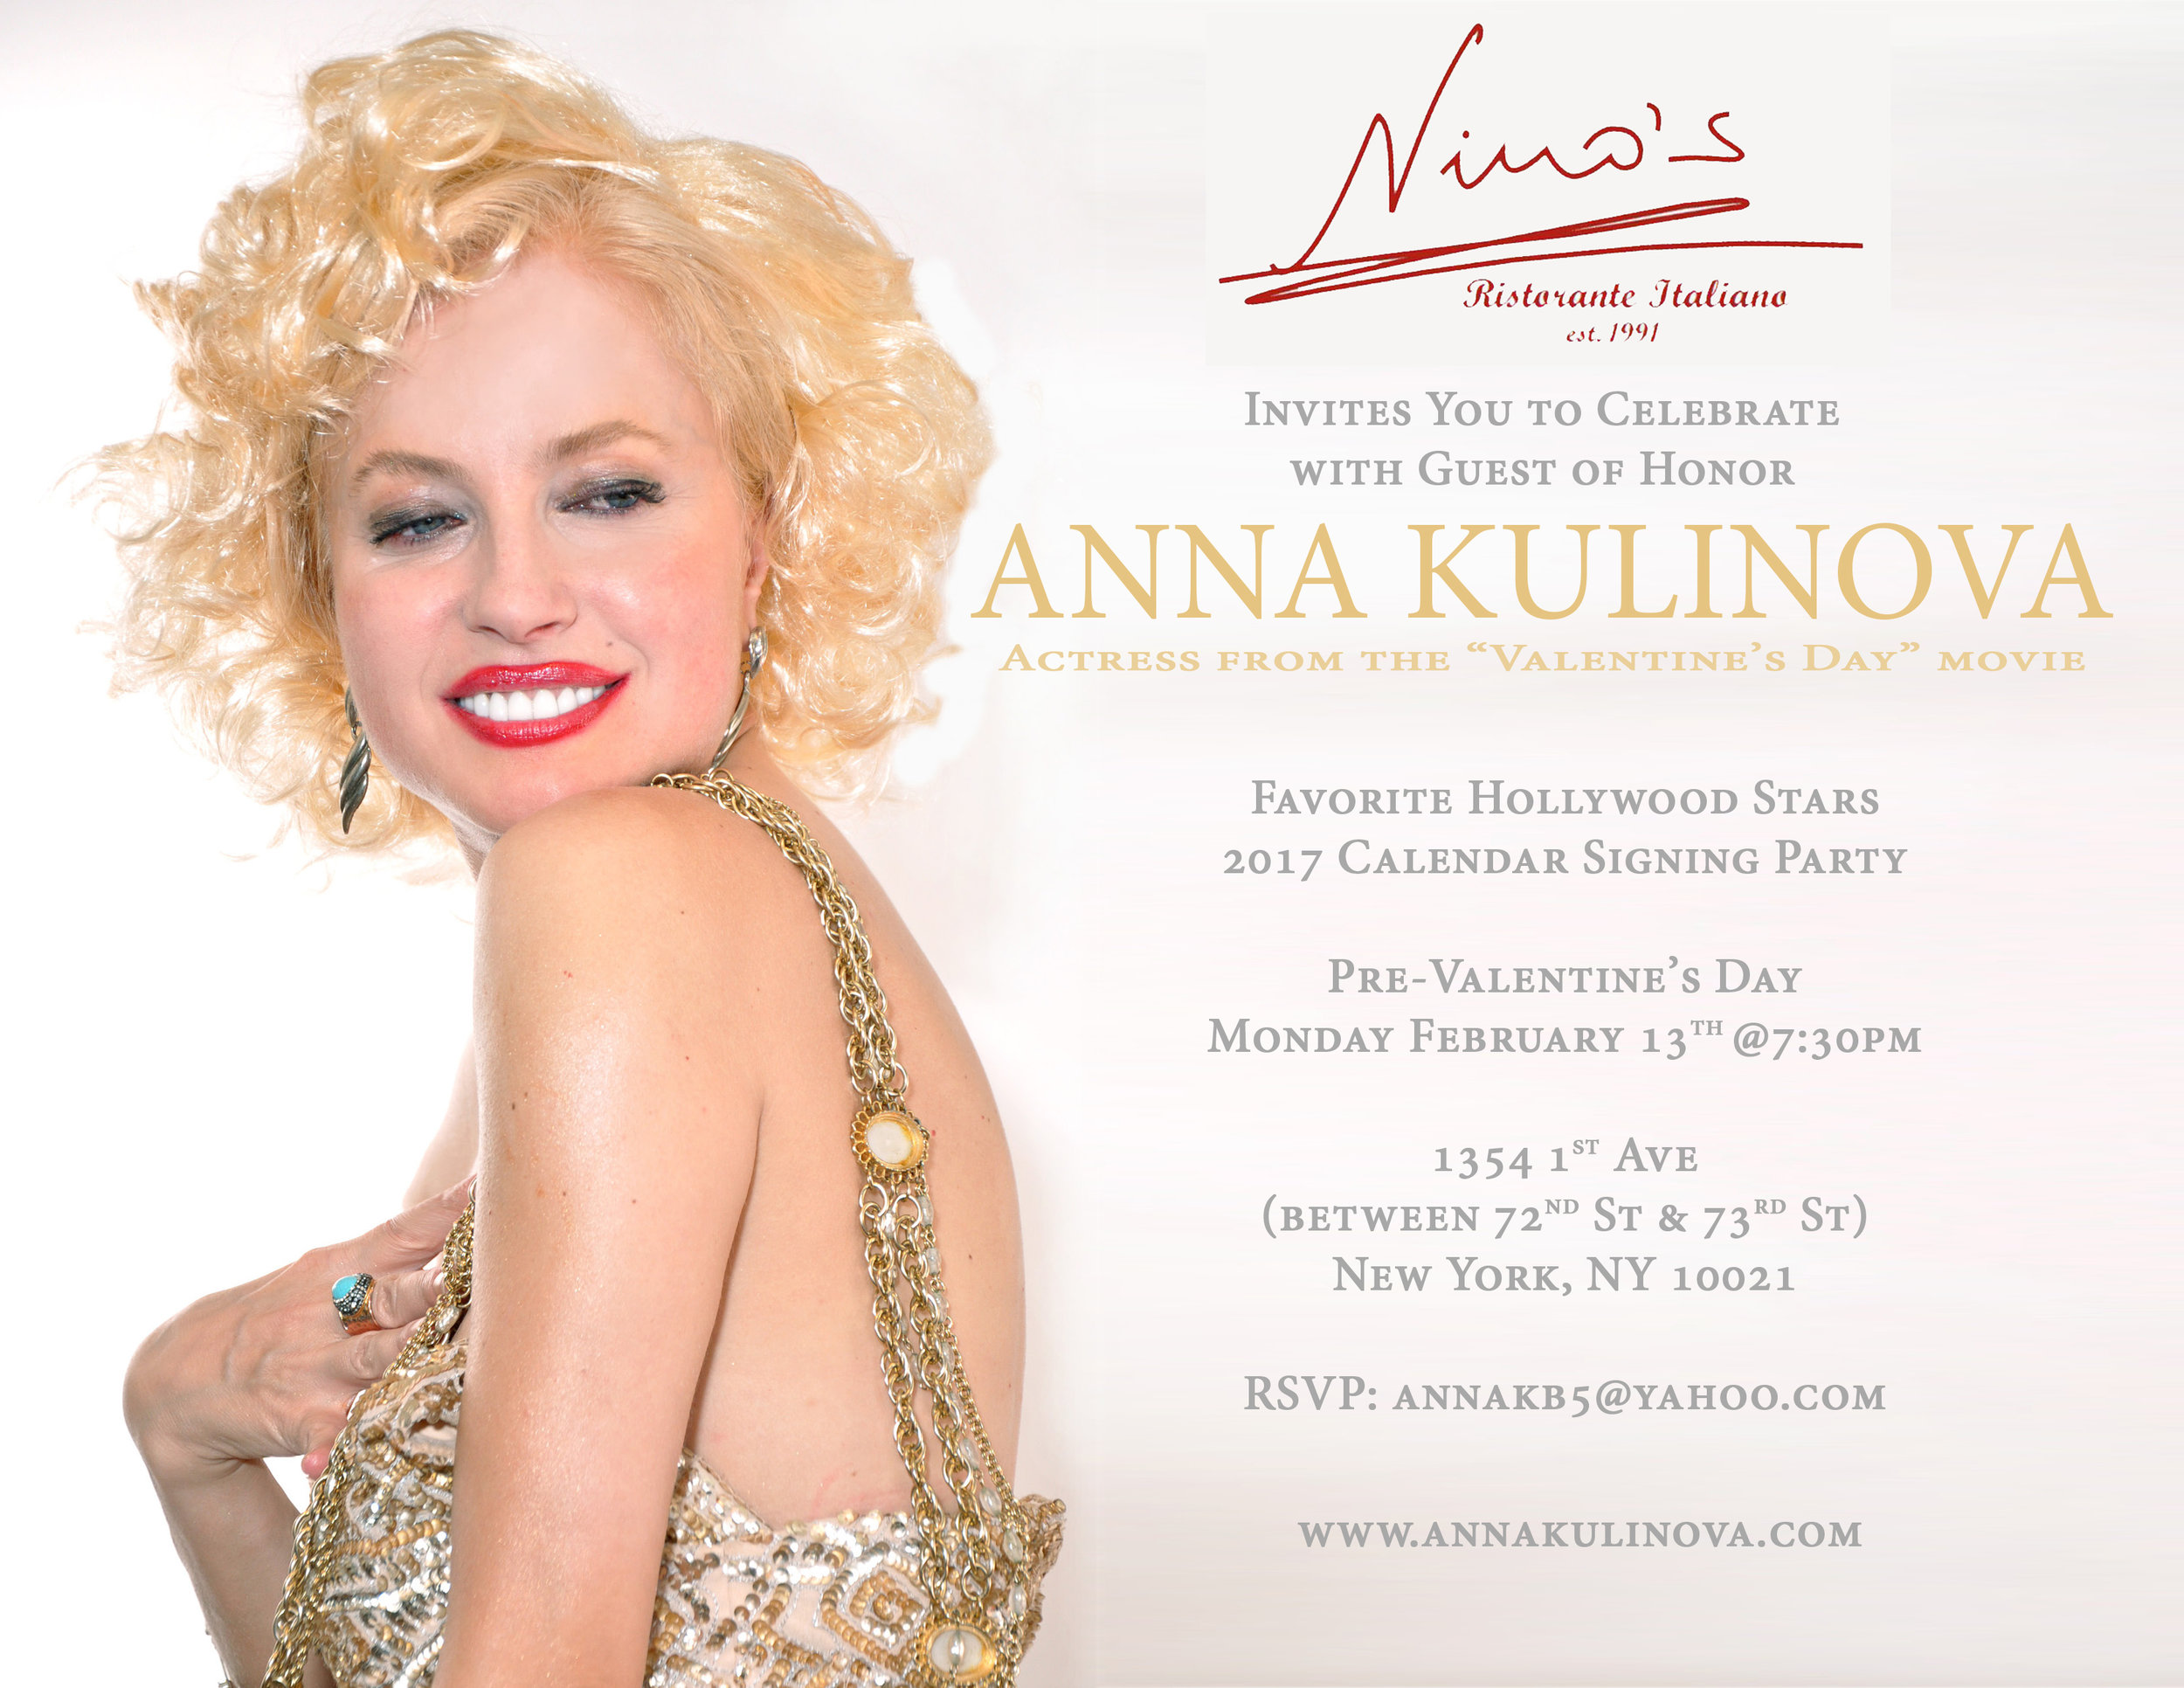 • Anna Kulinova online branding managed by Carlos Benitez